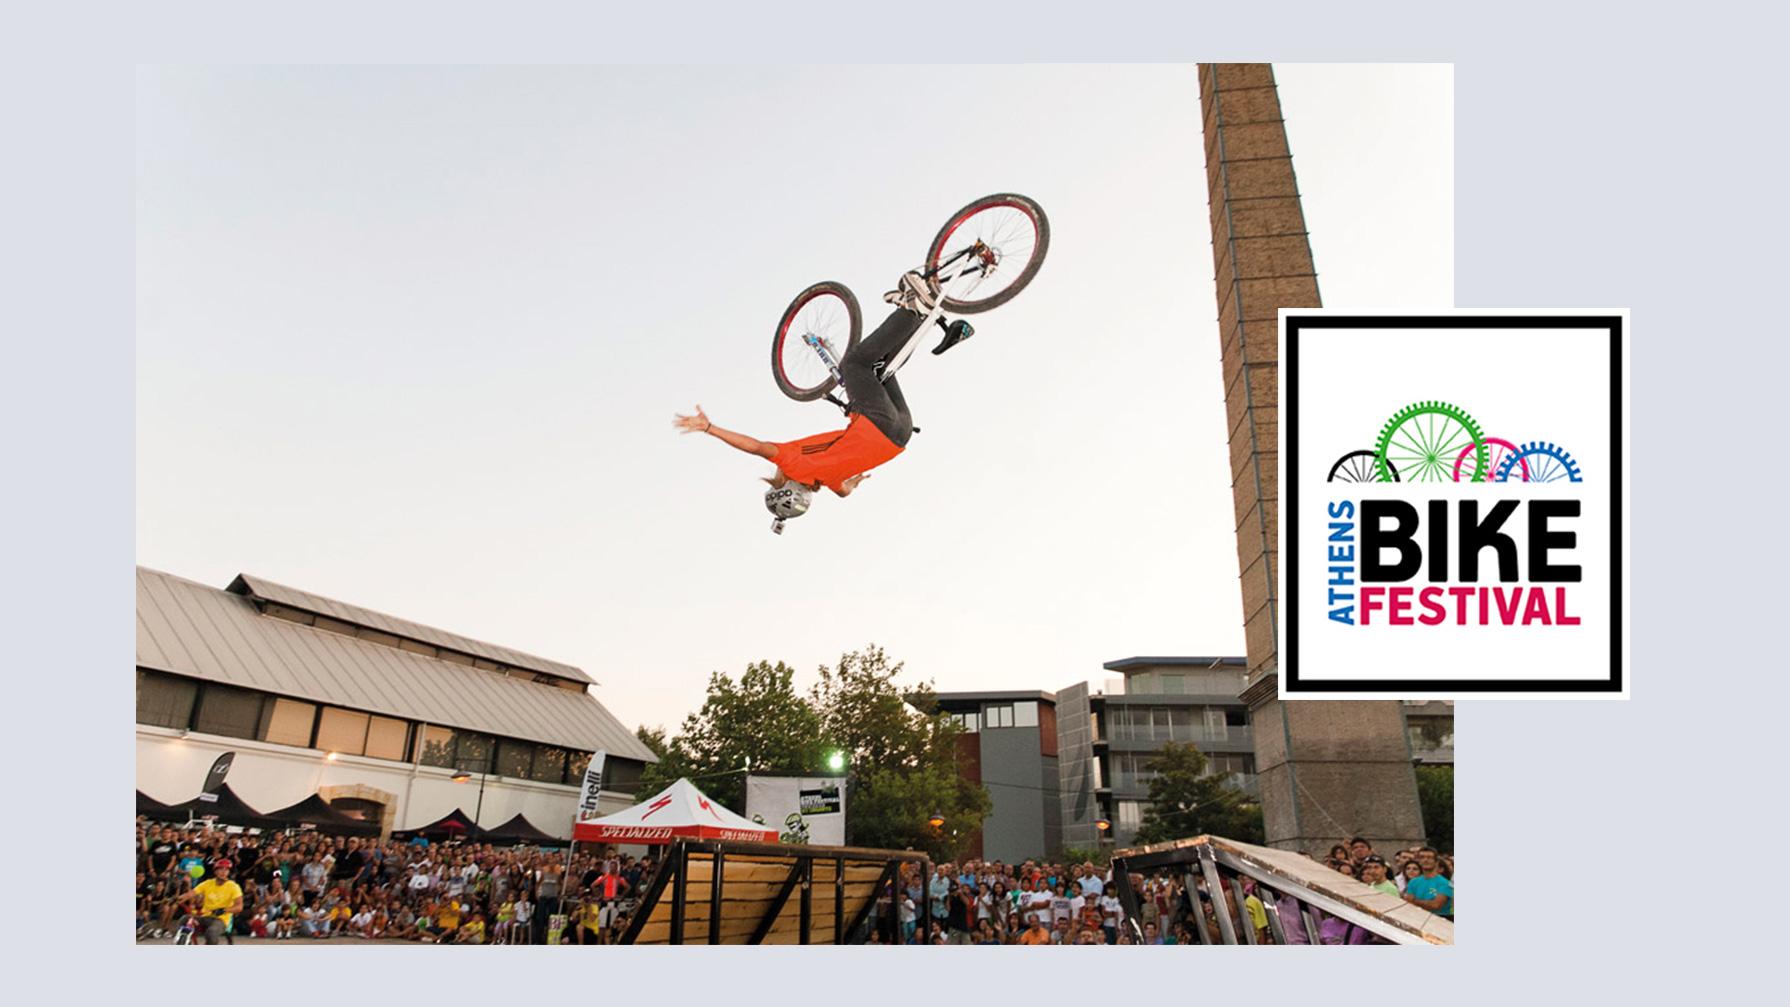 Bike Festival 2012 article cover image